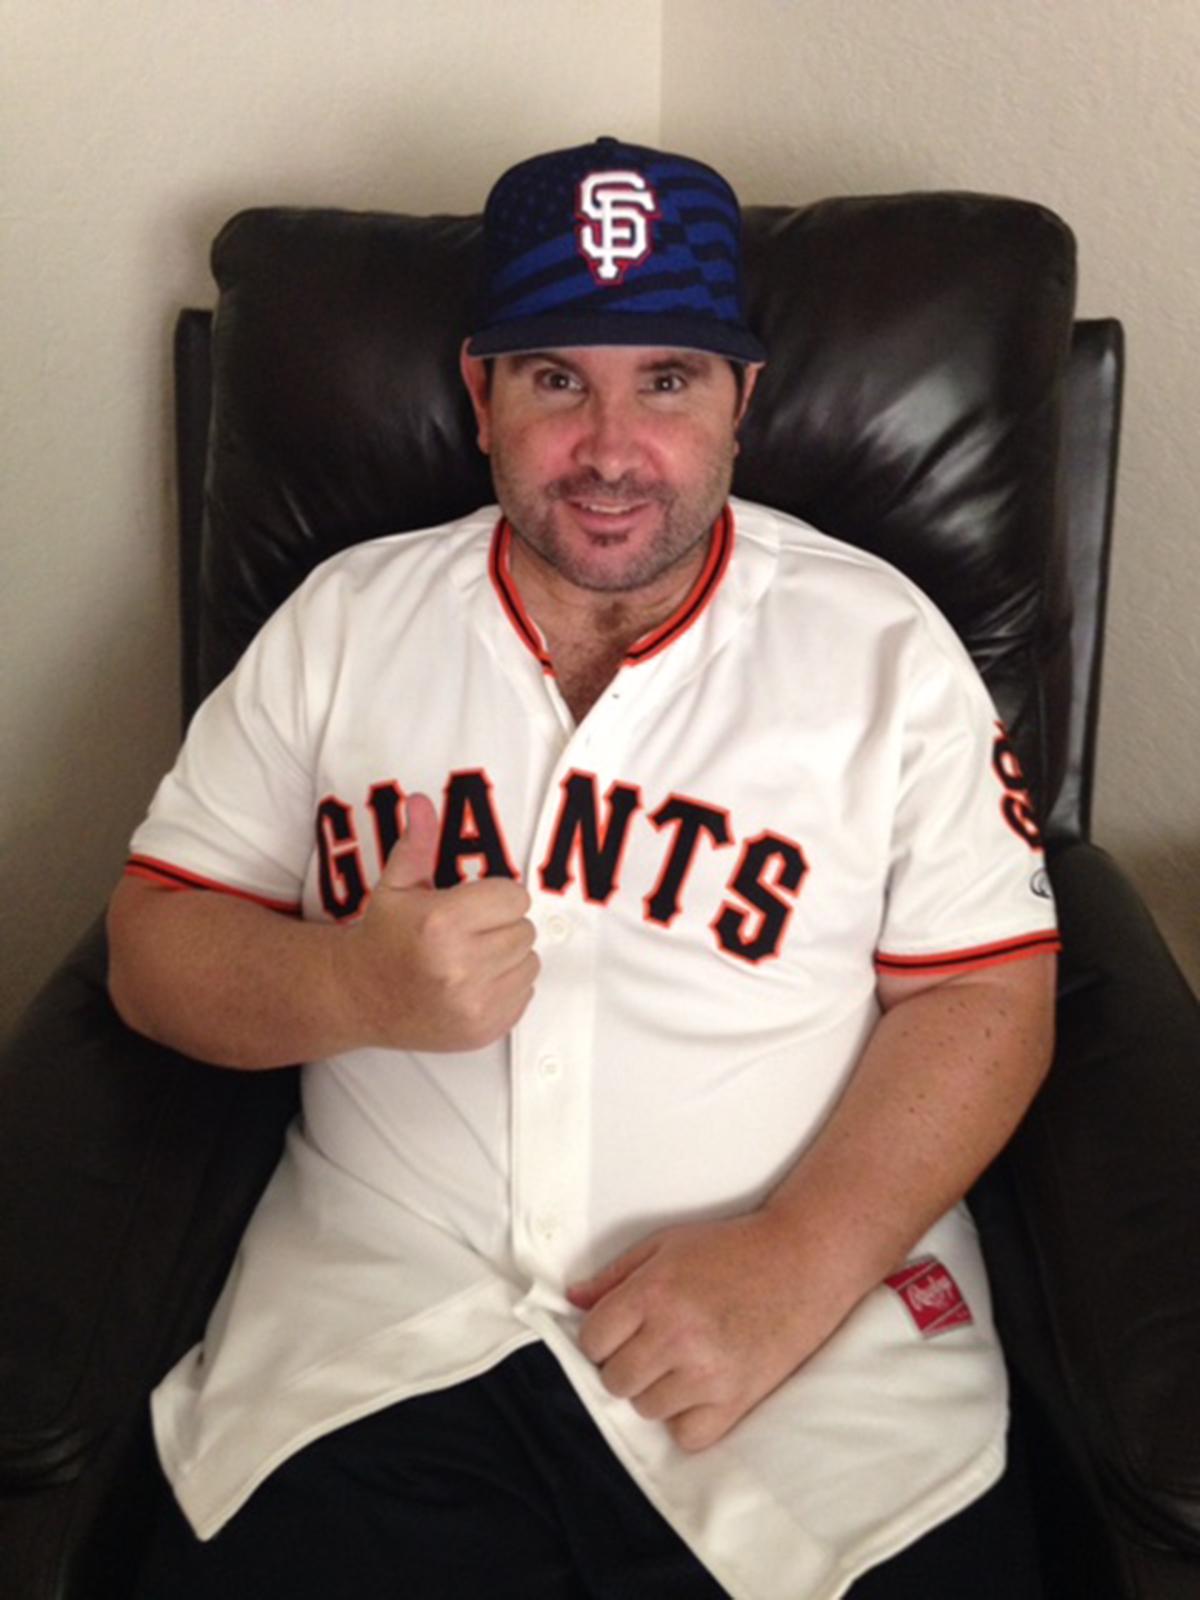 Bryan ❤ Giants!